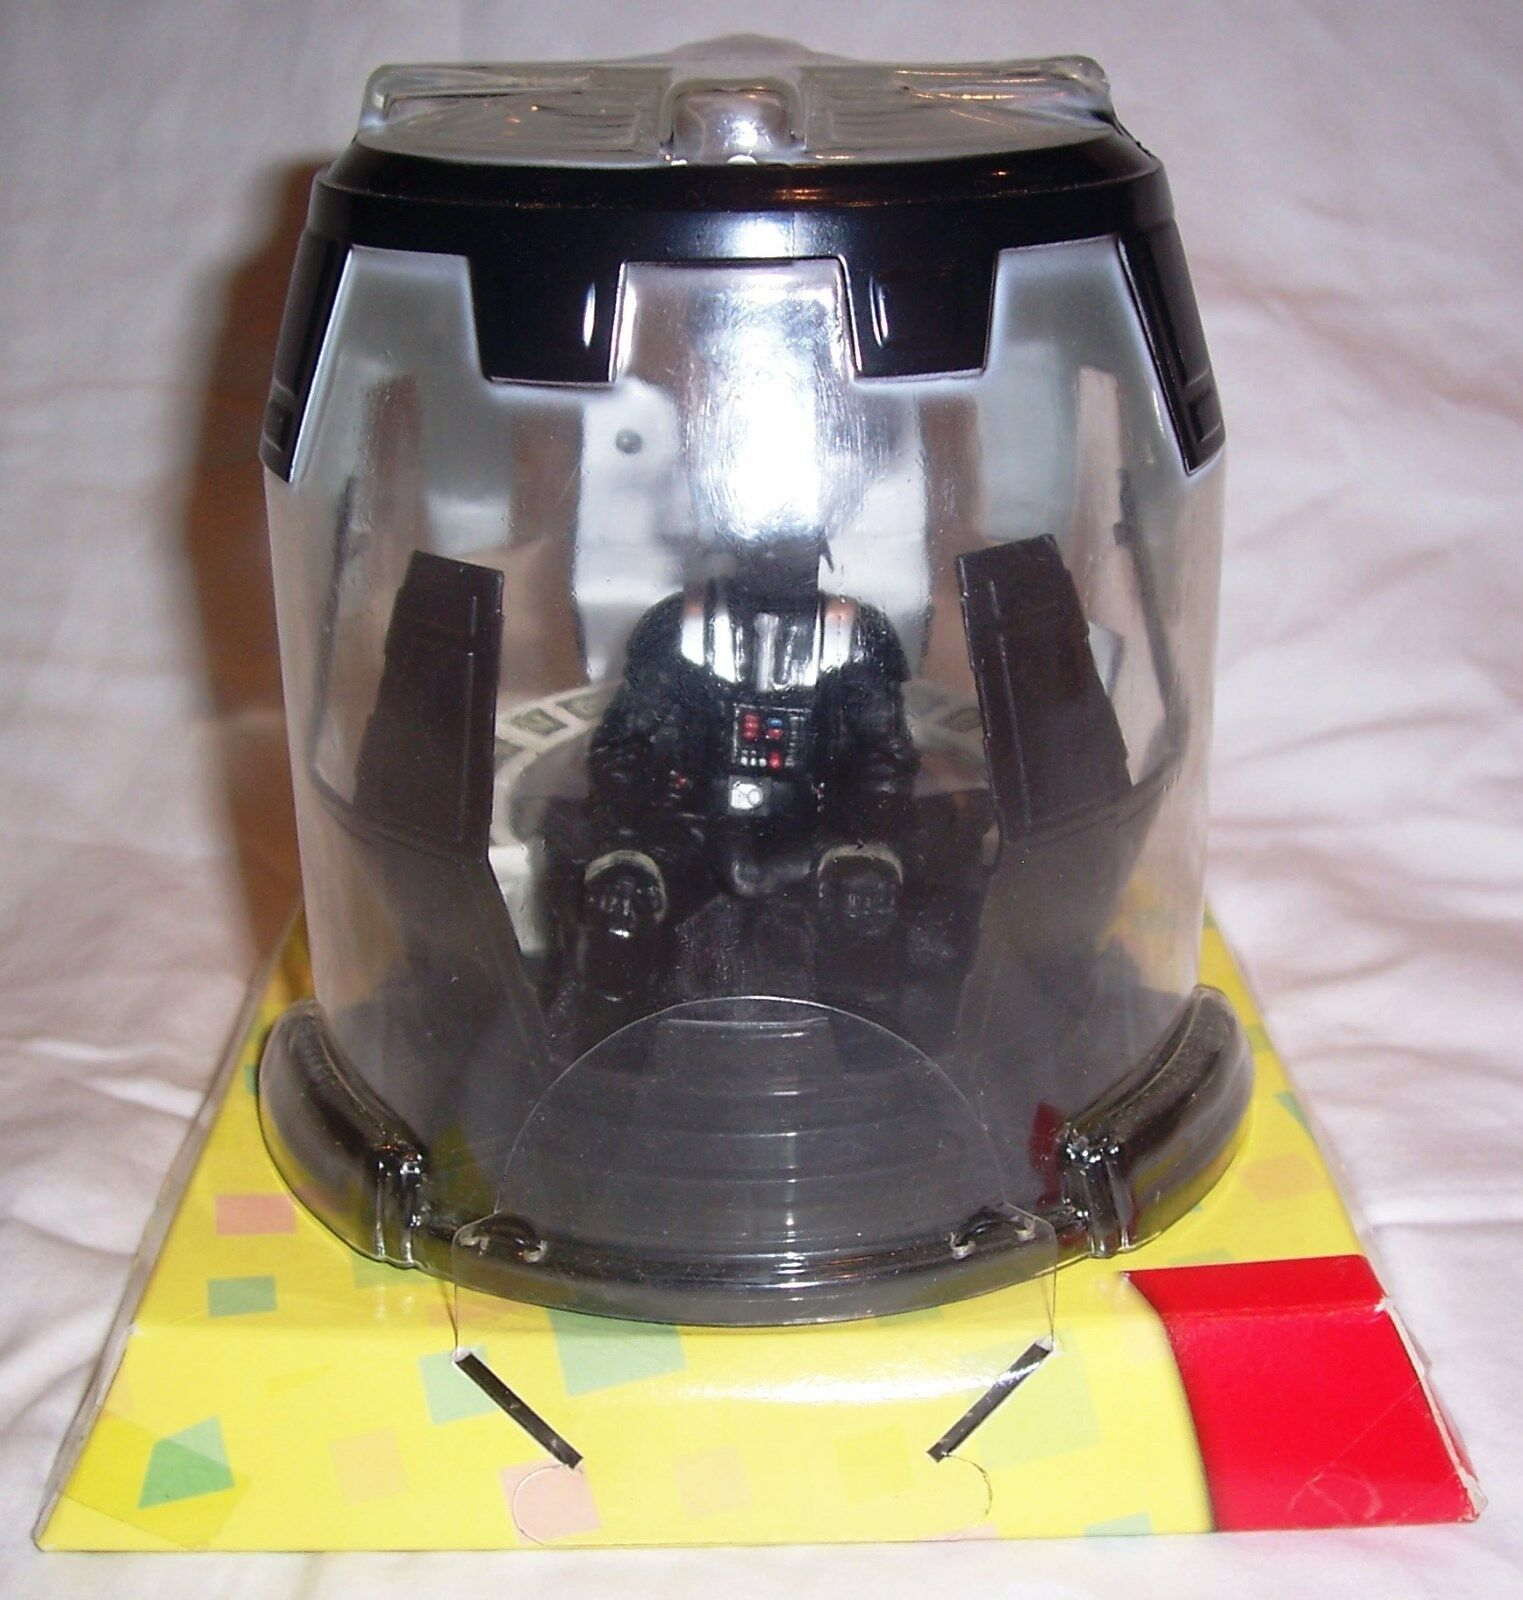 estrella guerras 500th cifra Darth Vader 85413 MockUp  PreProduction  VERY RARE